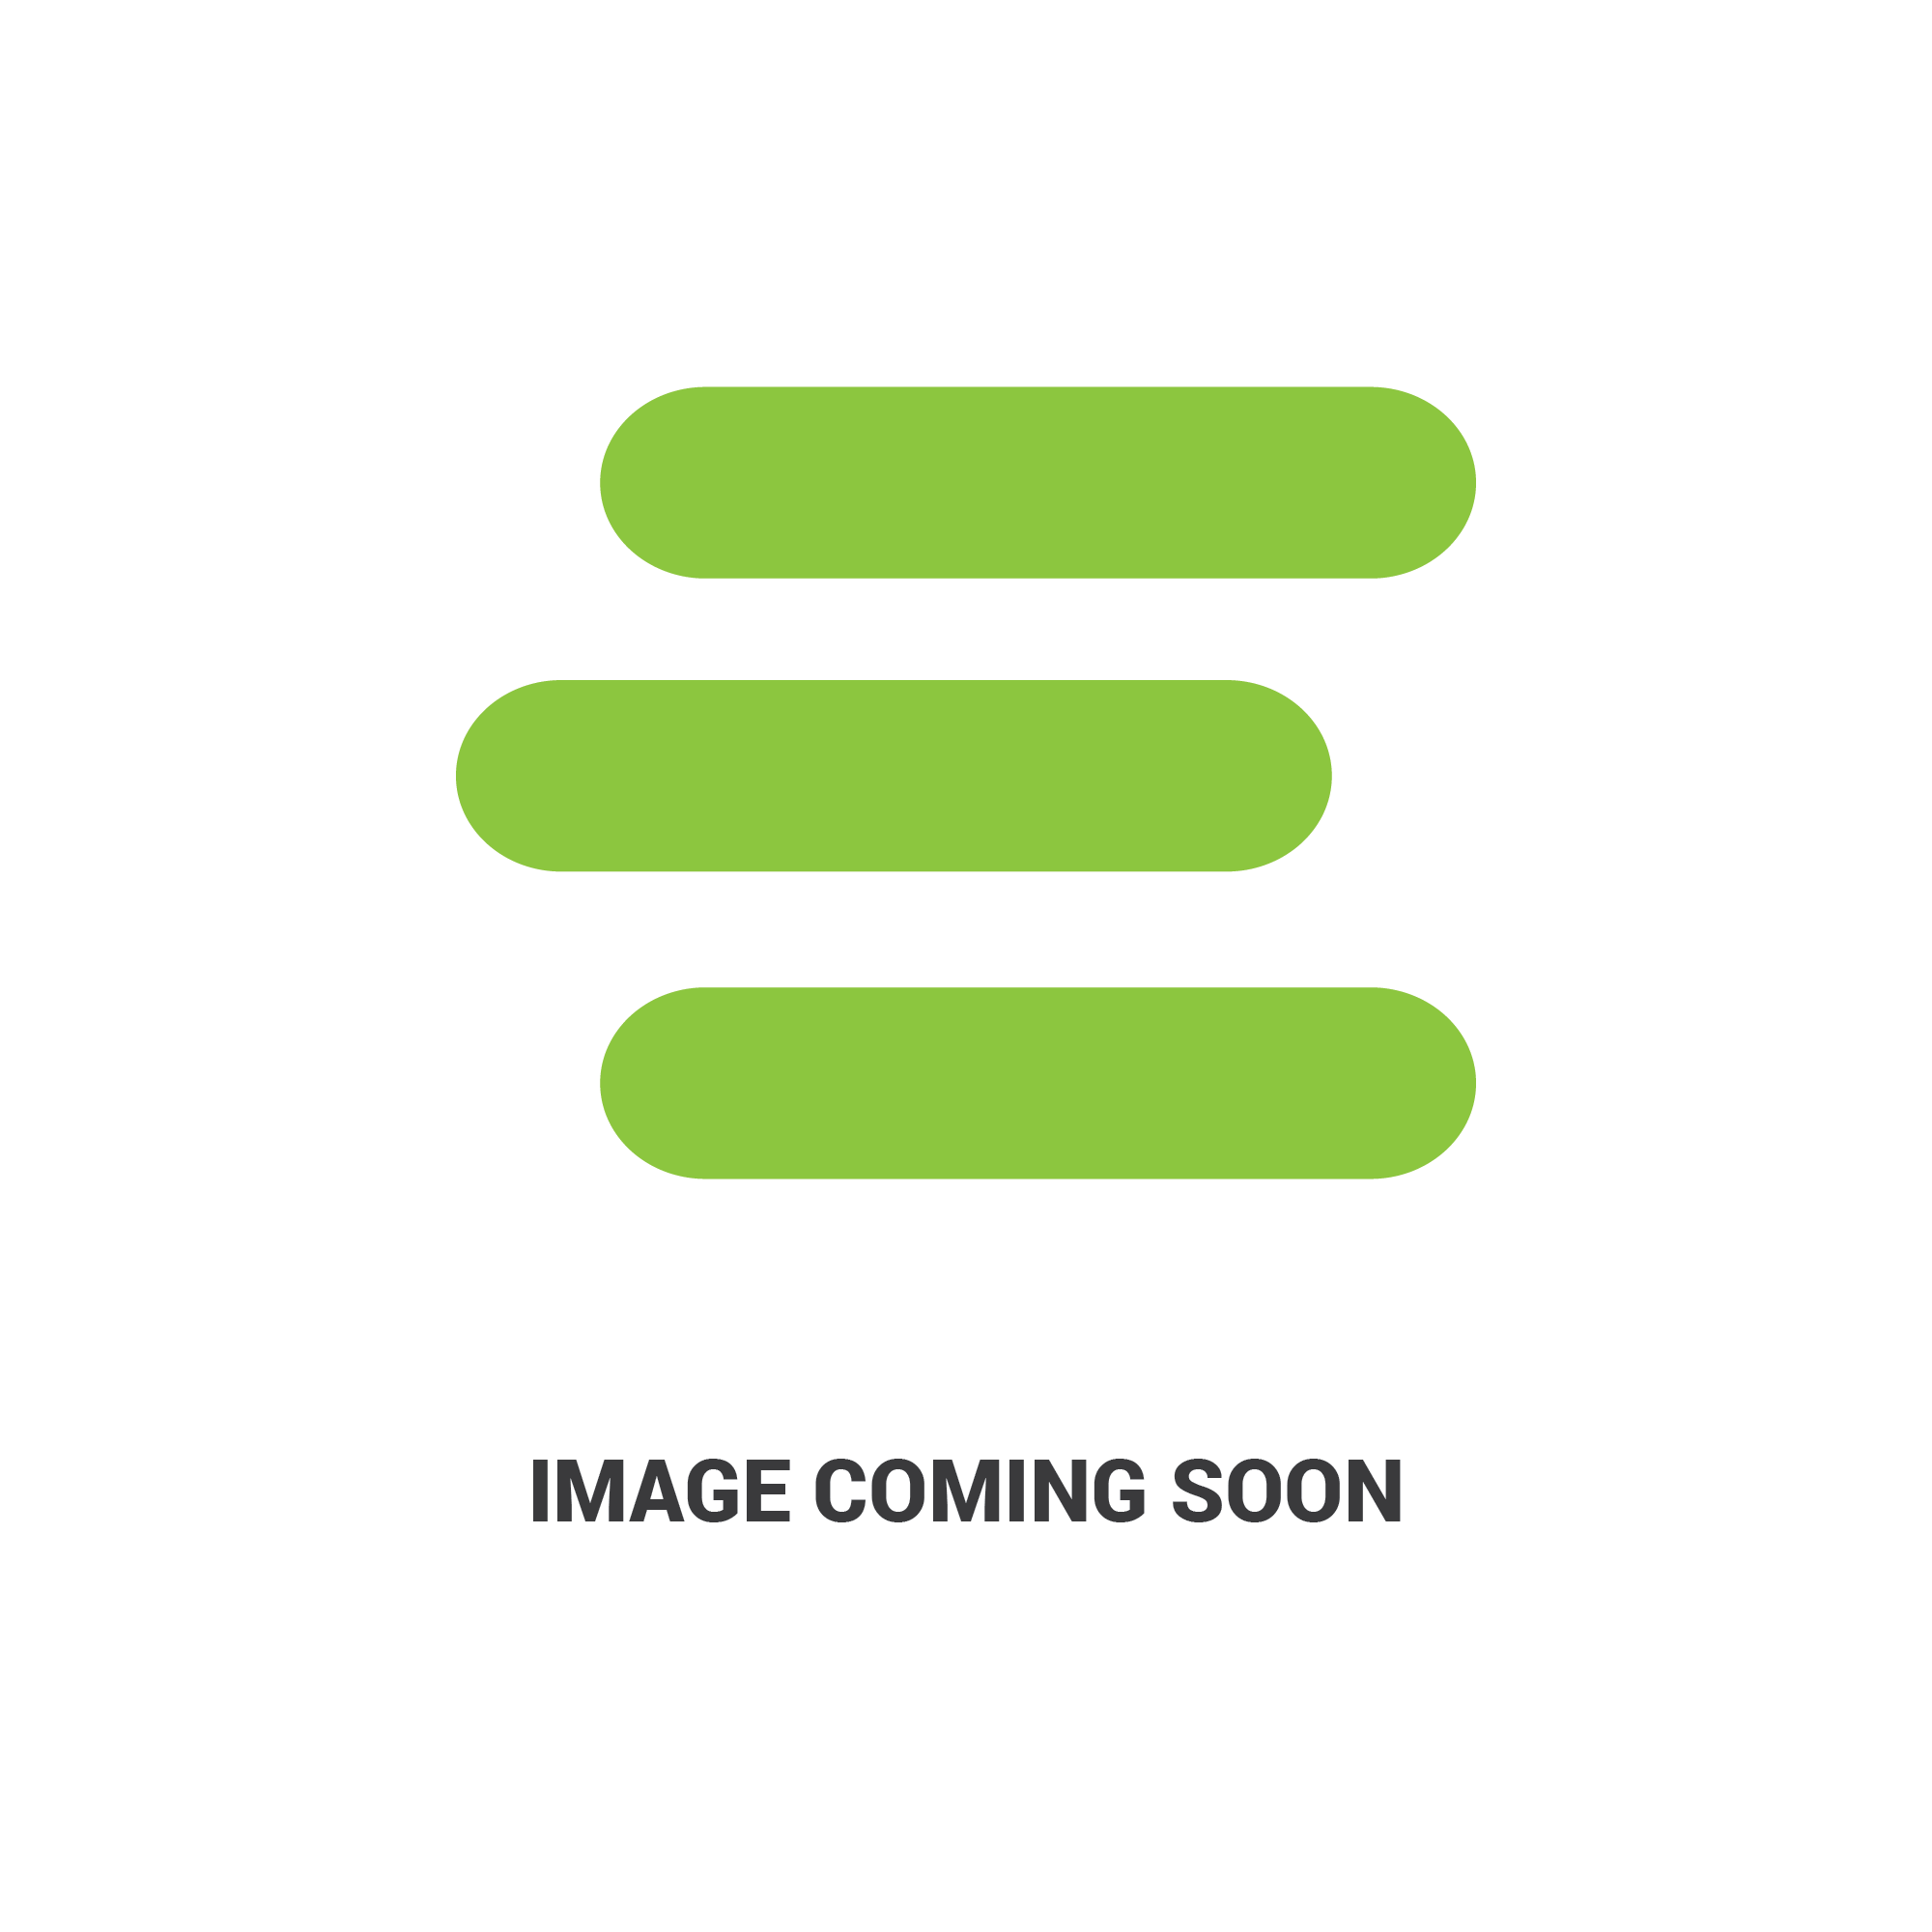 E-3J080-10872edit 5.jpg